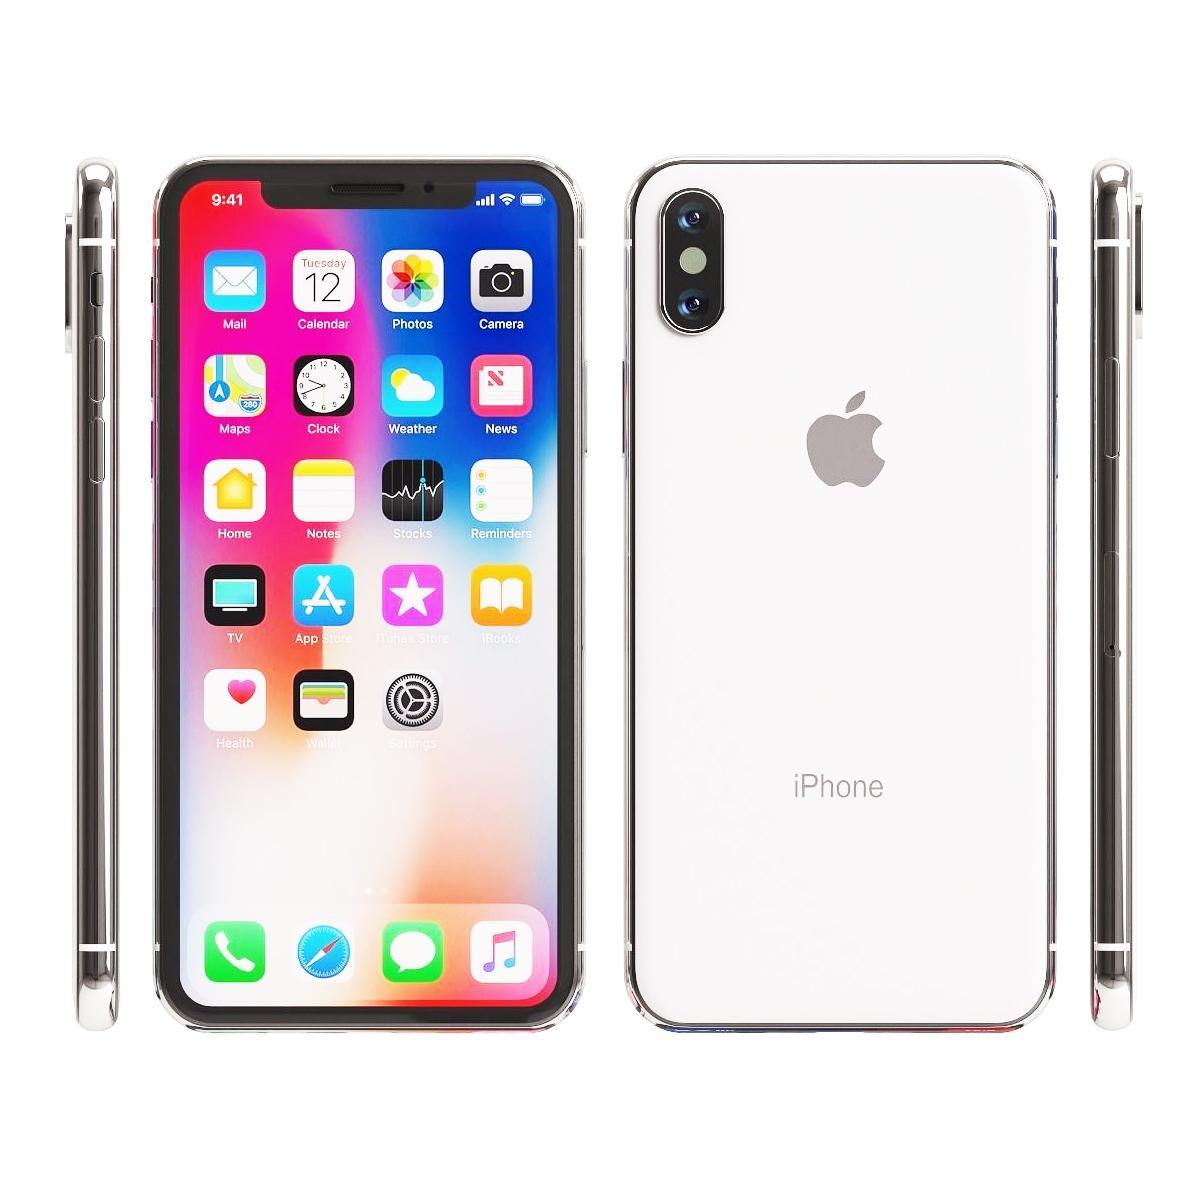 Harga Refurbished Apple Iphone 5 64 Gb White Black Garansi 6 Grey Gold Distributor 1 Tahun X Smartphone Silver Brand Original 100